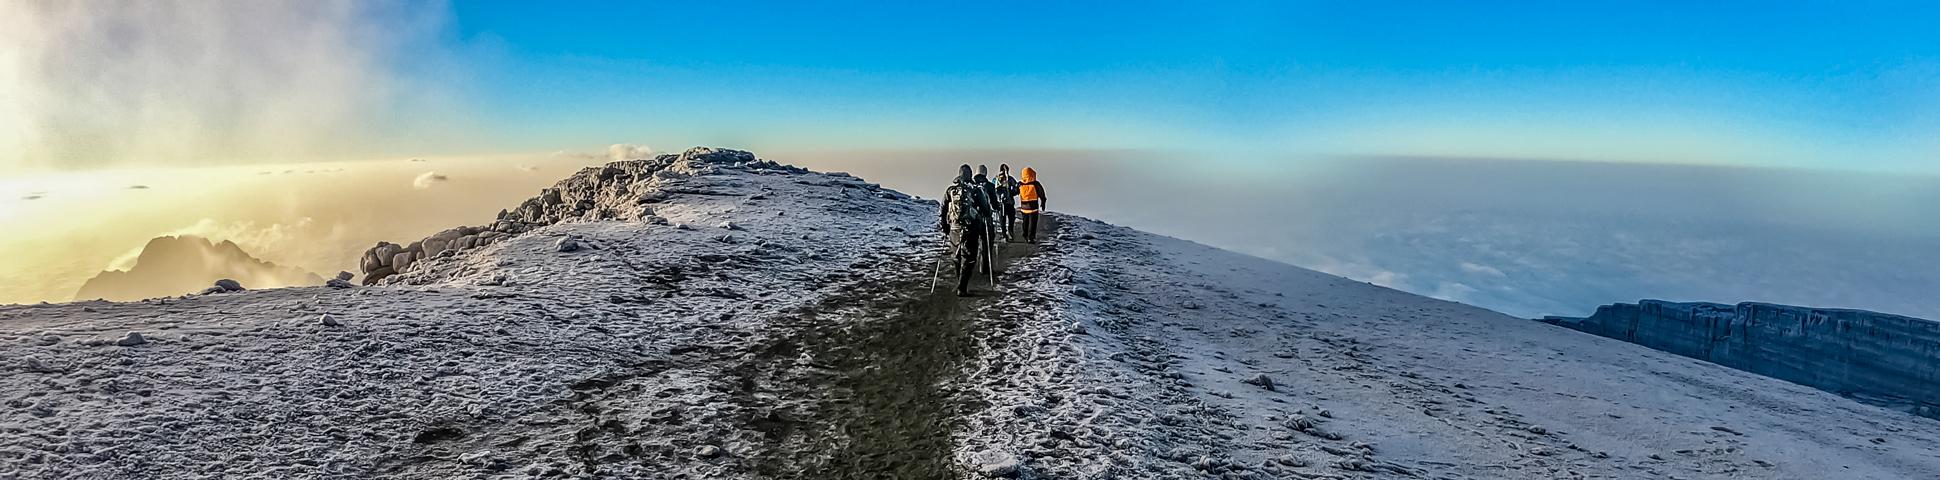 Panoramic view from Mount Meru Trek